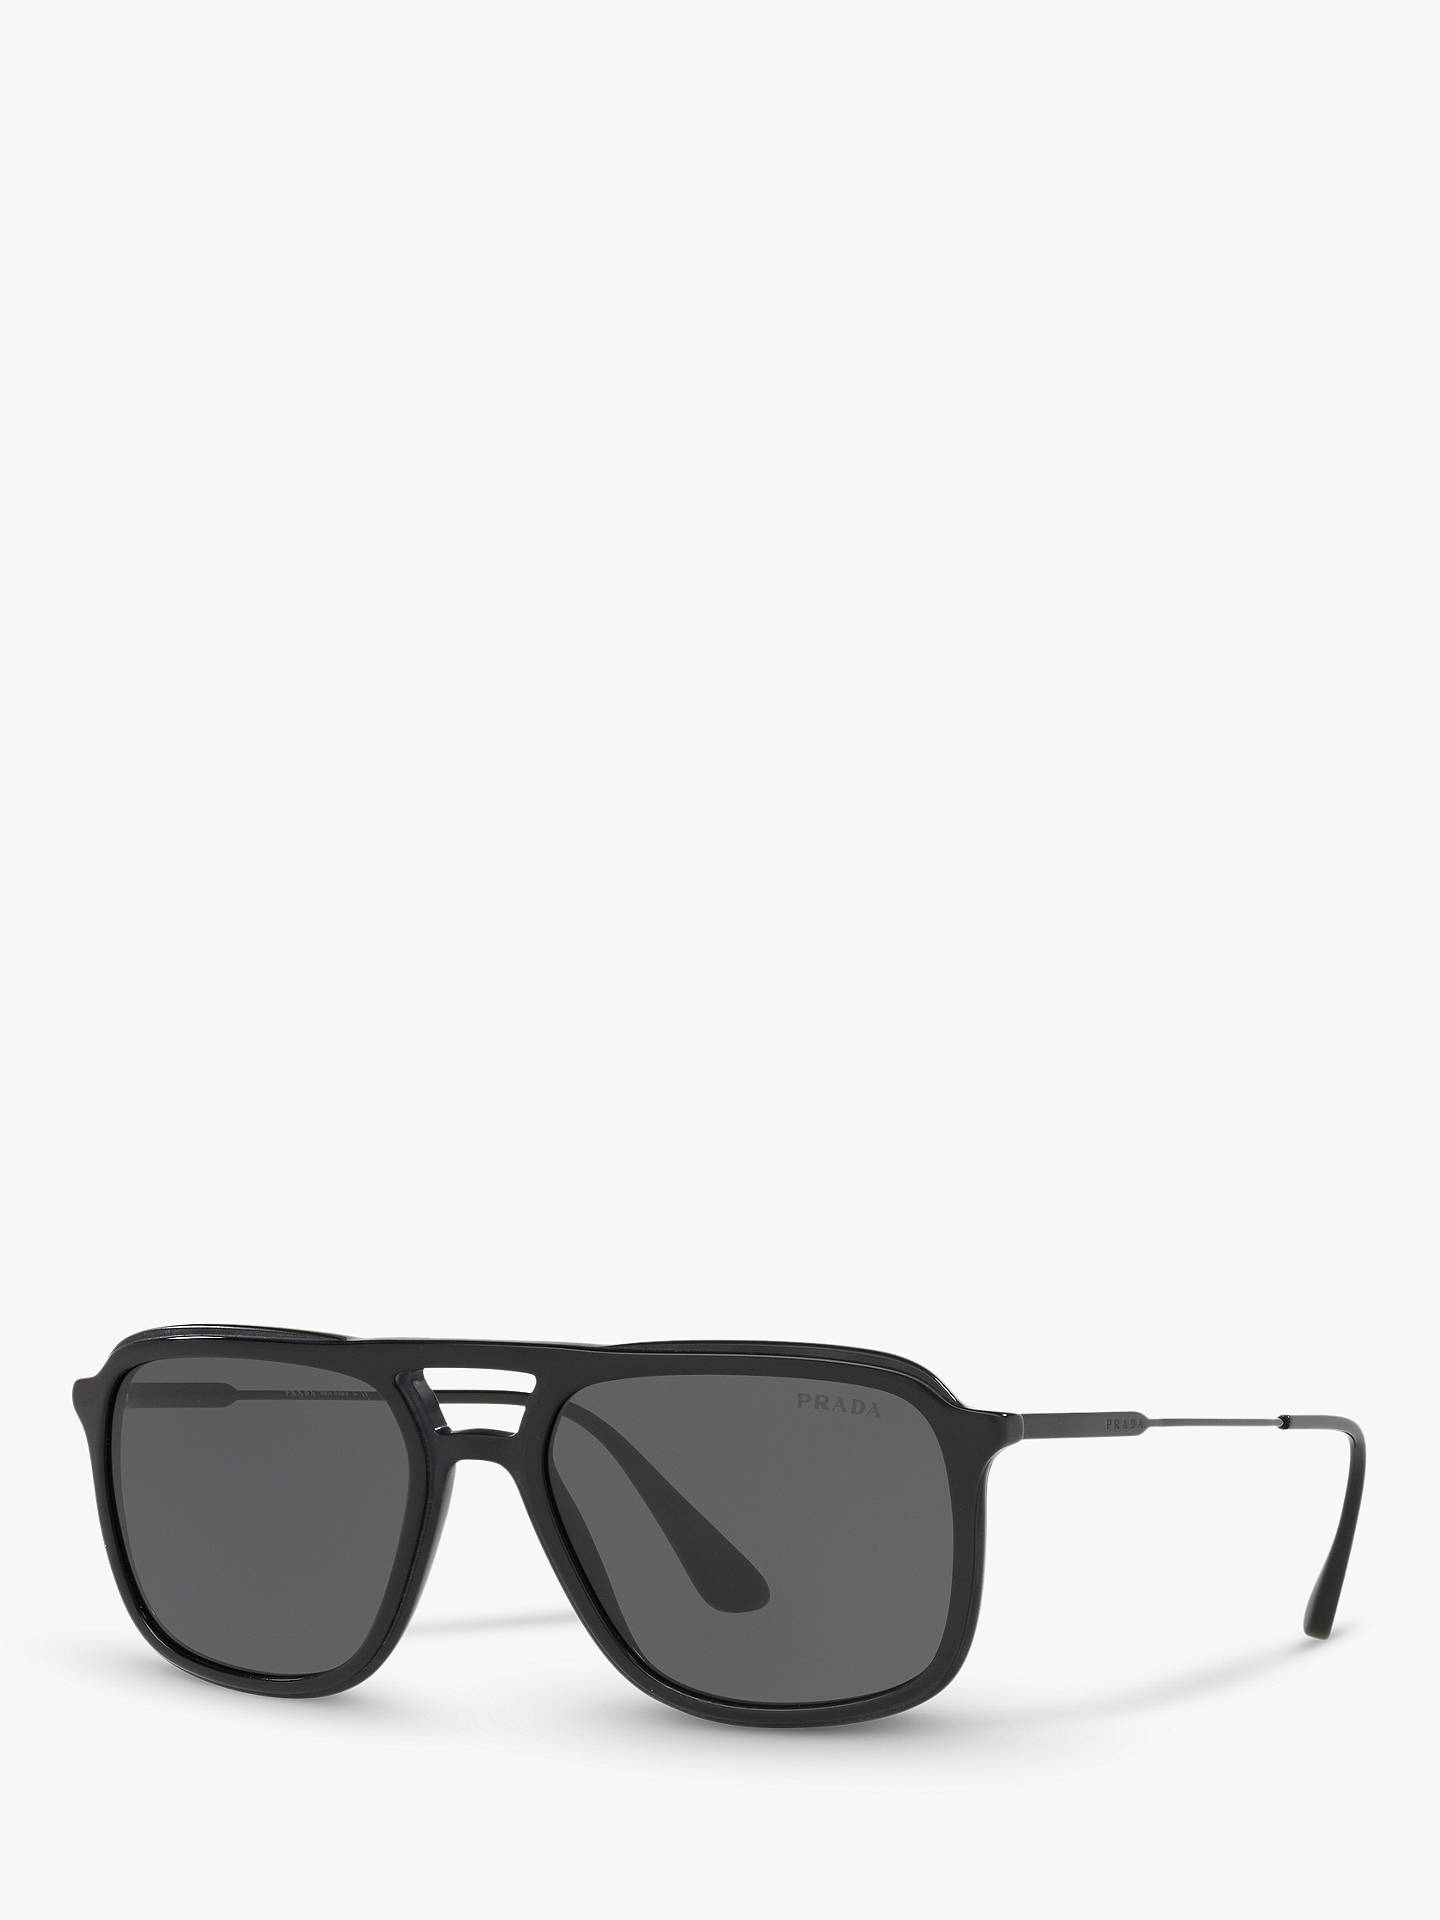 9248f7330ea9 Buy Prada PR 06VS Men's Square Sunglasses, Black/Grey Online at johnlewis.  ...